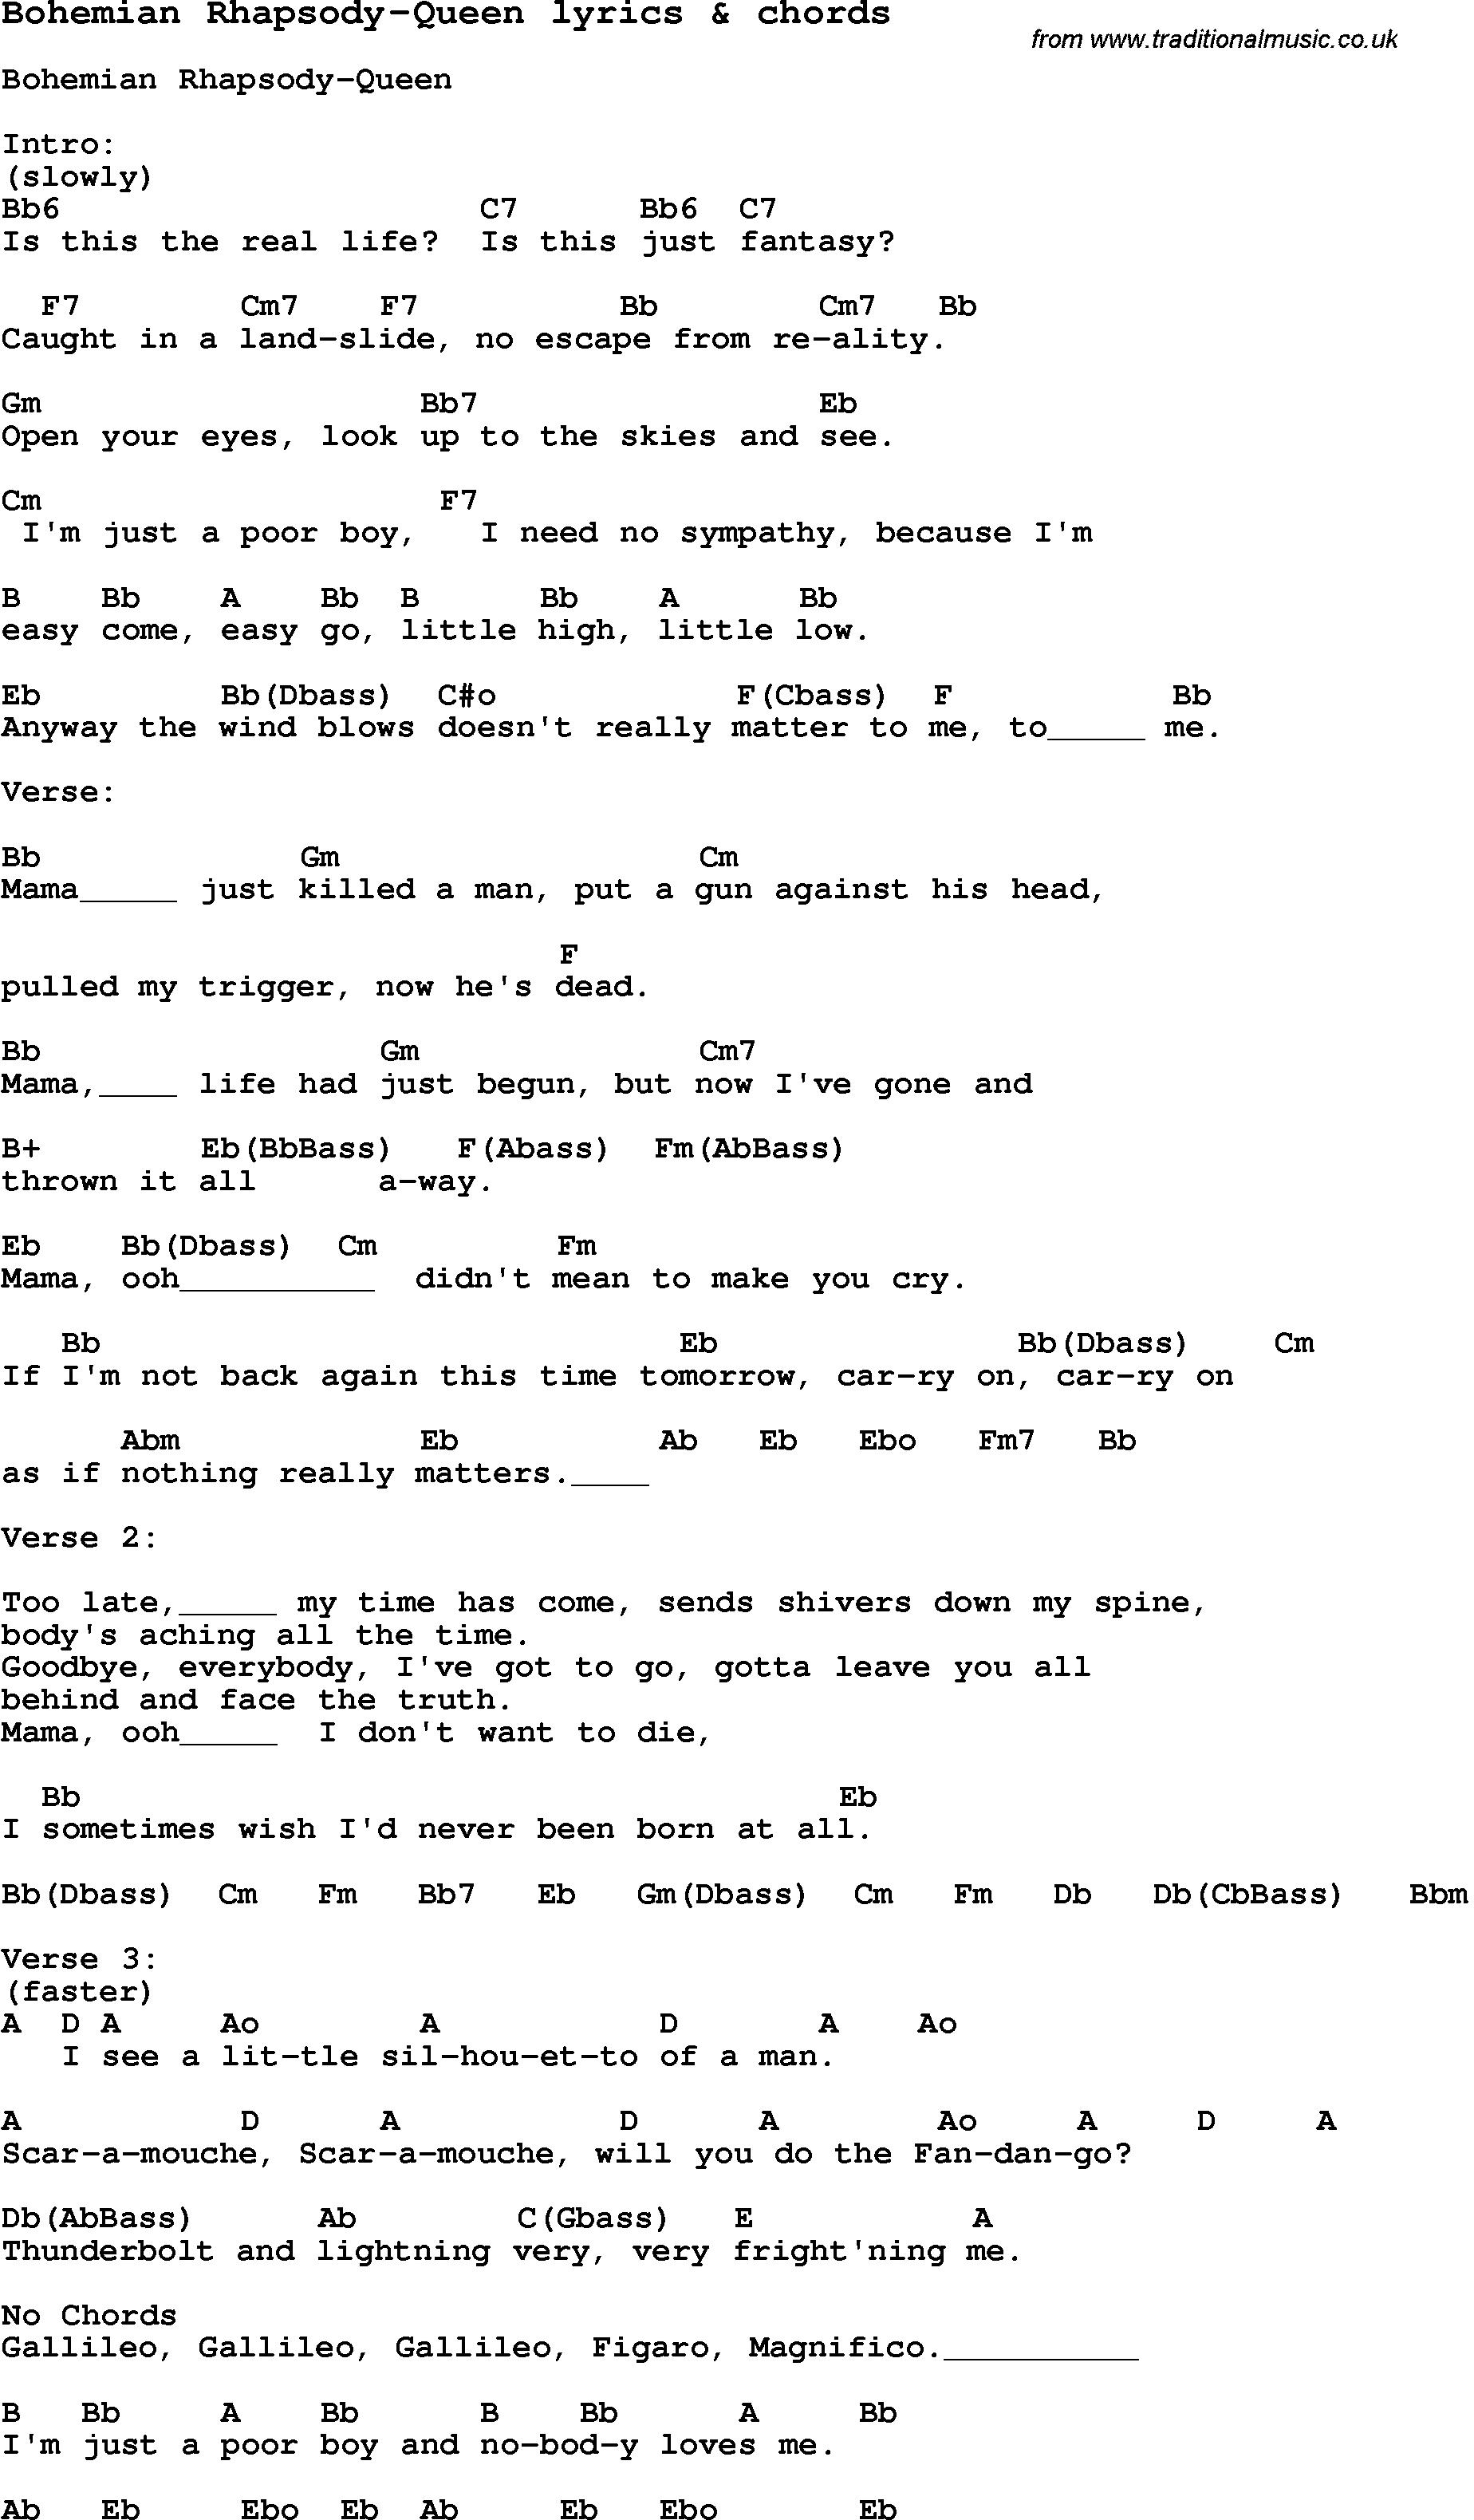 Song Lyrics To Bohemian Rhapsody